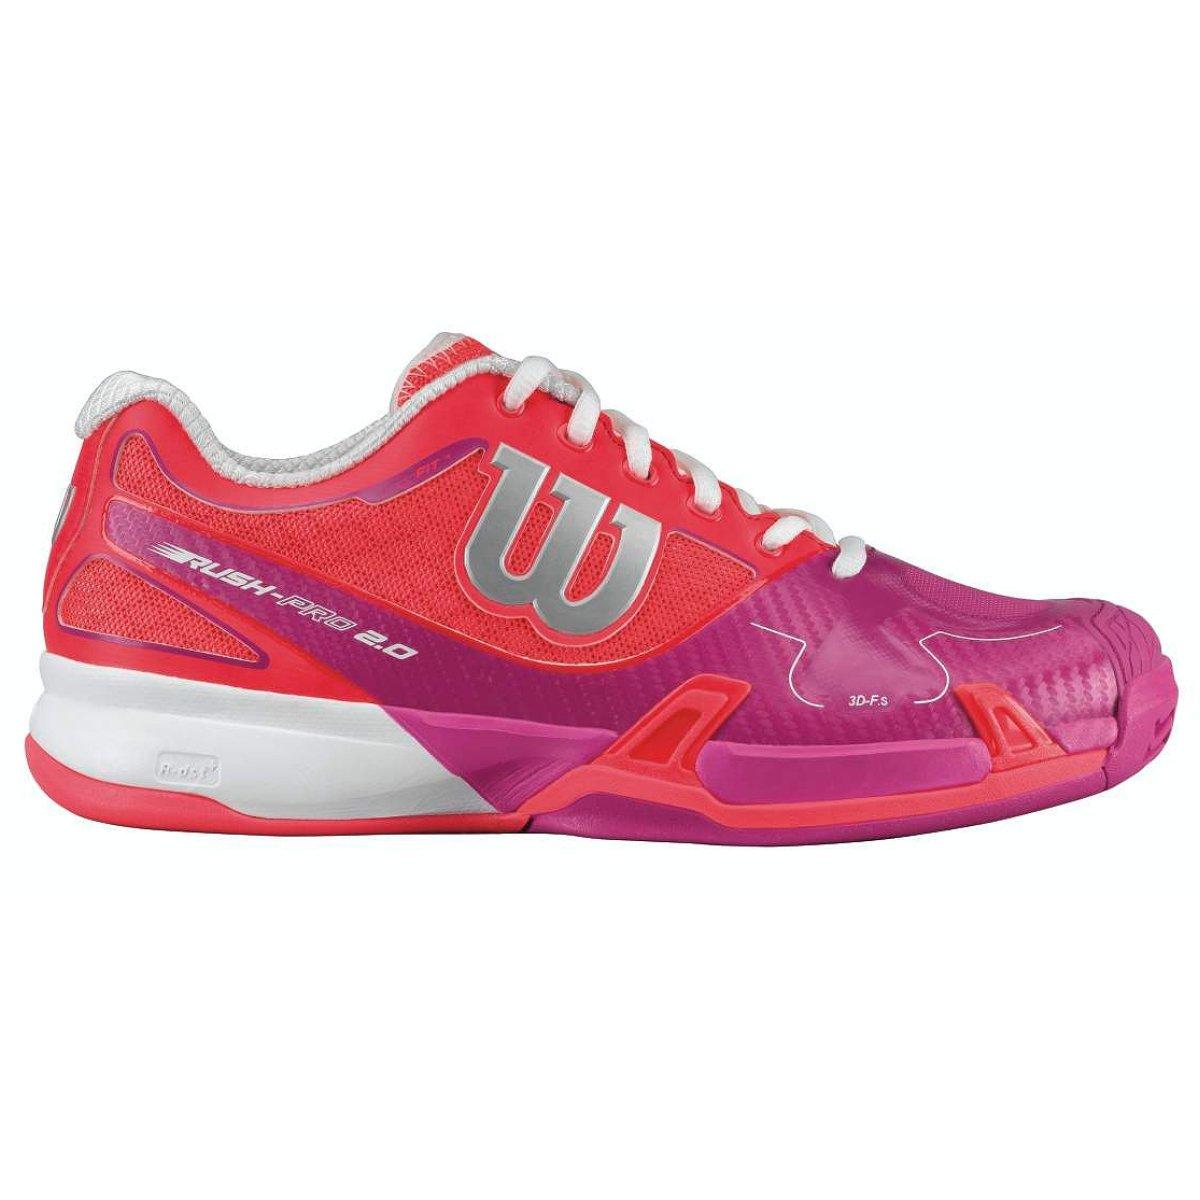 Wilson Rush Pro Pro Pro 2.0 W, Zapatillas de Tenis Unisex Adulto a3ba92